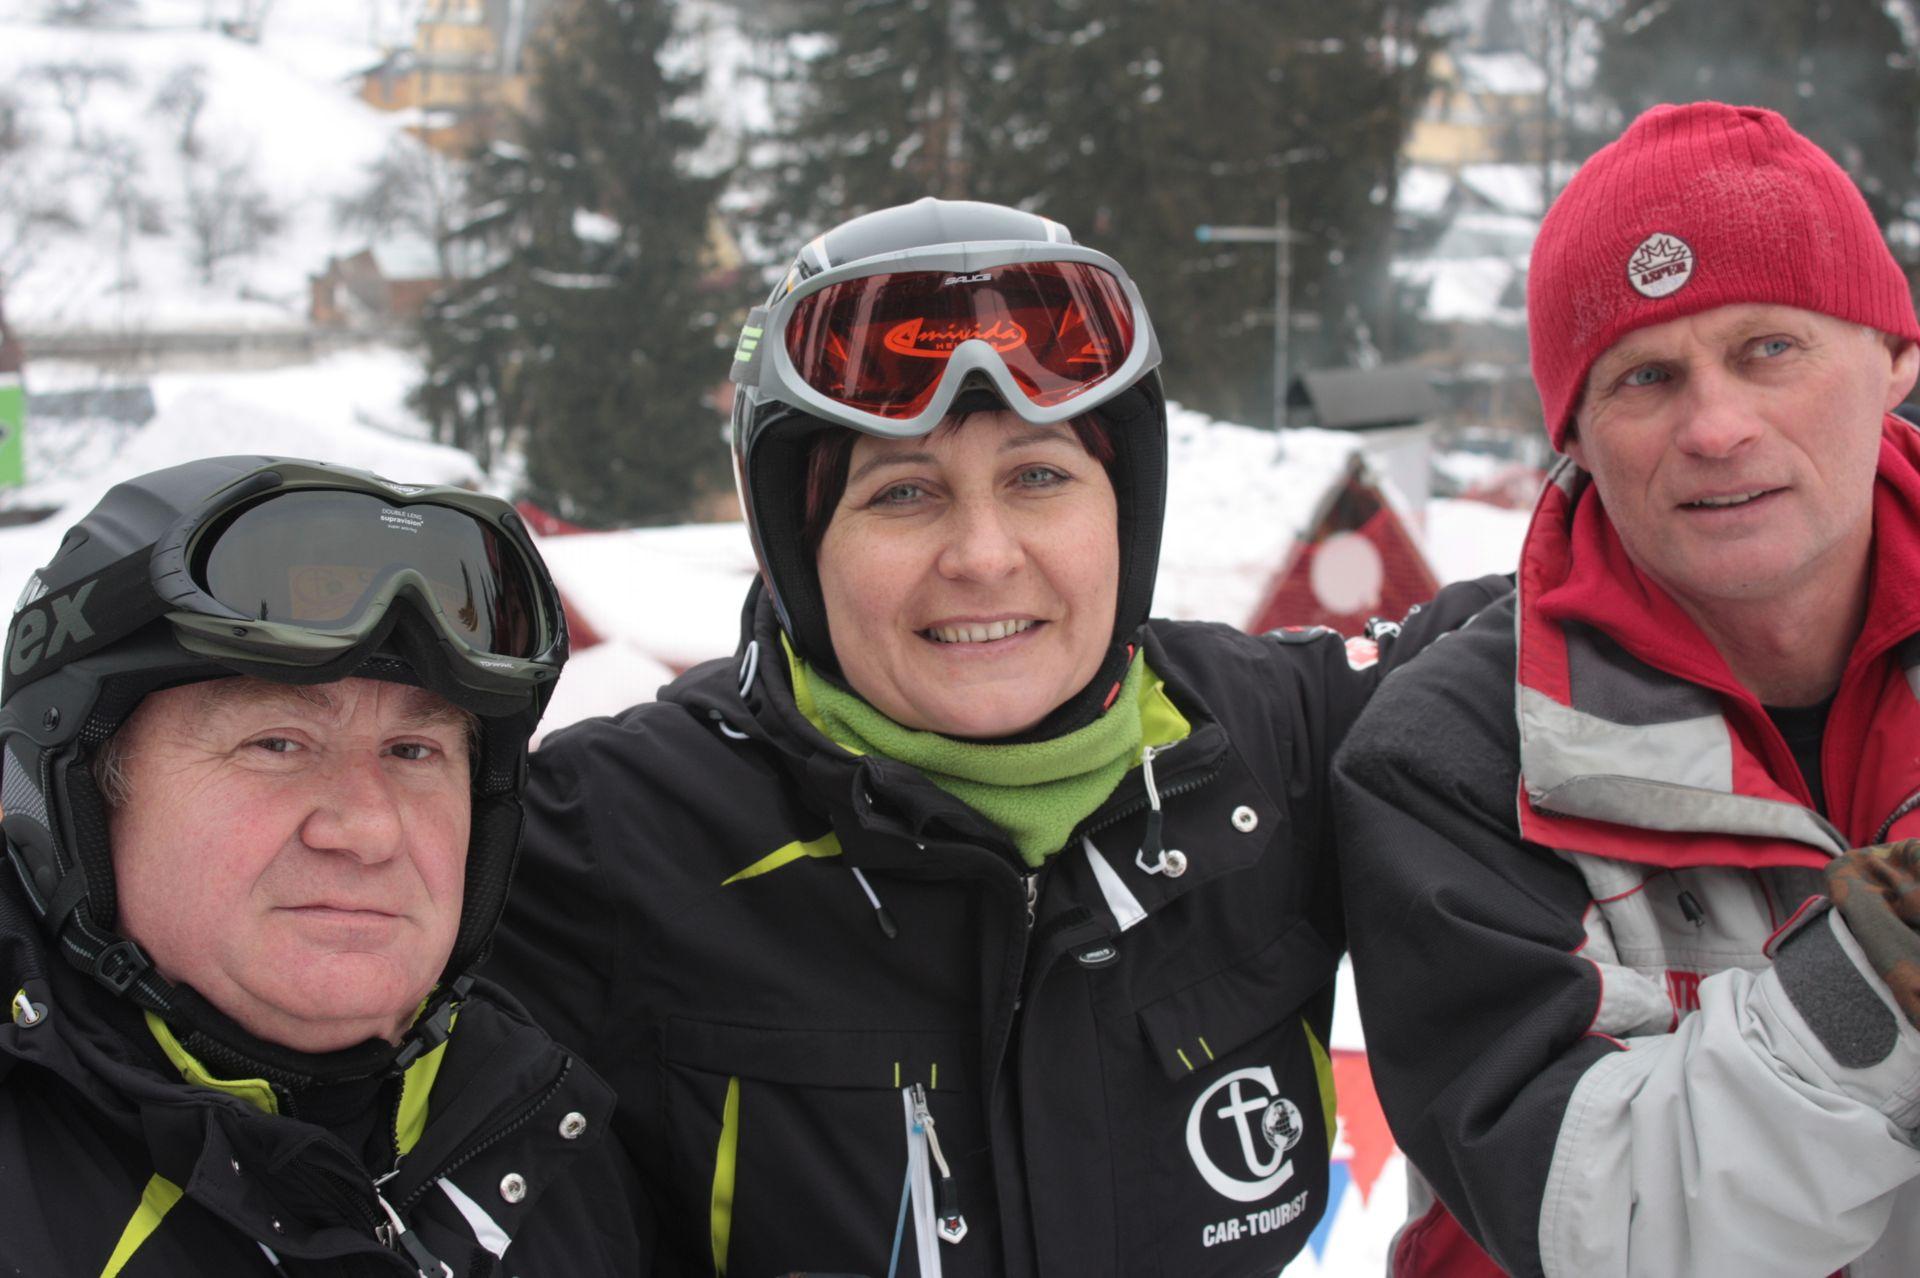 CarTourist_narty-snowboard_2012-foto-20